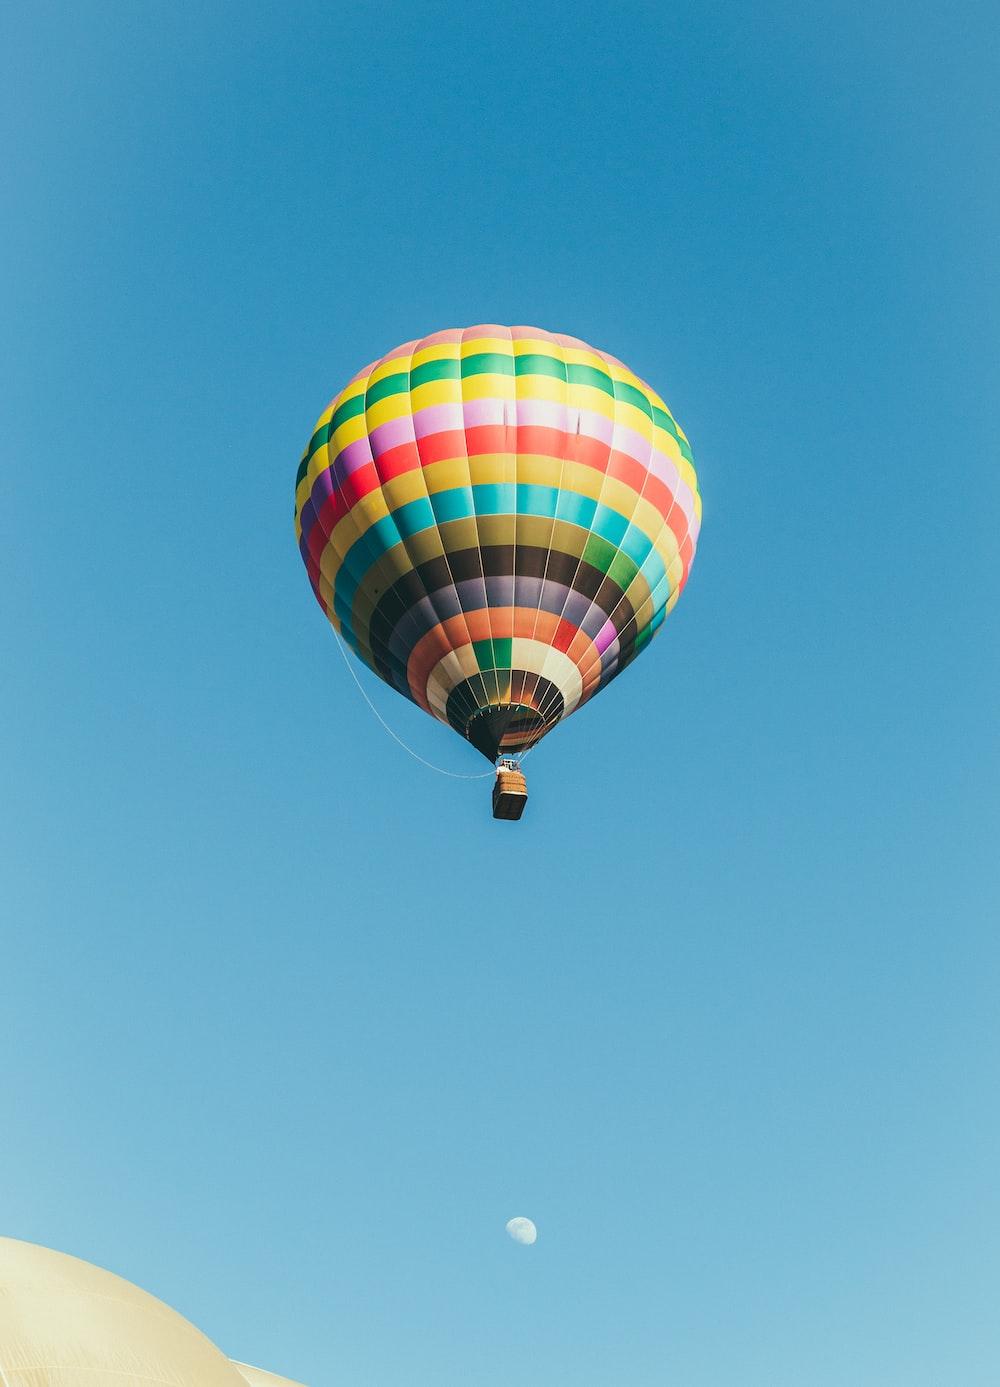 multicolored hot air balloon under blue sky